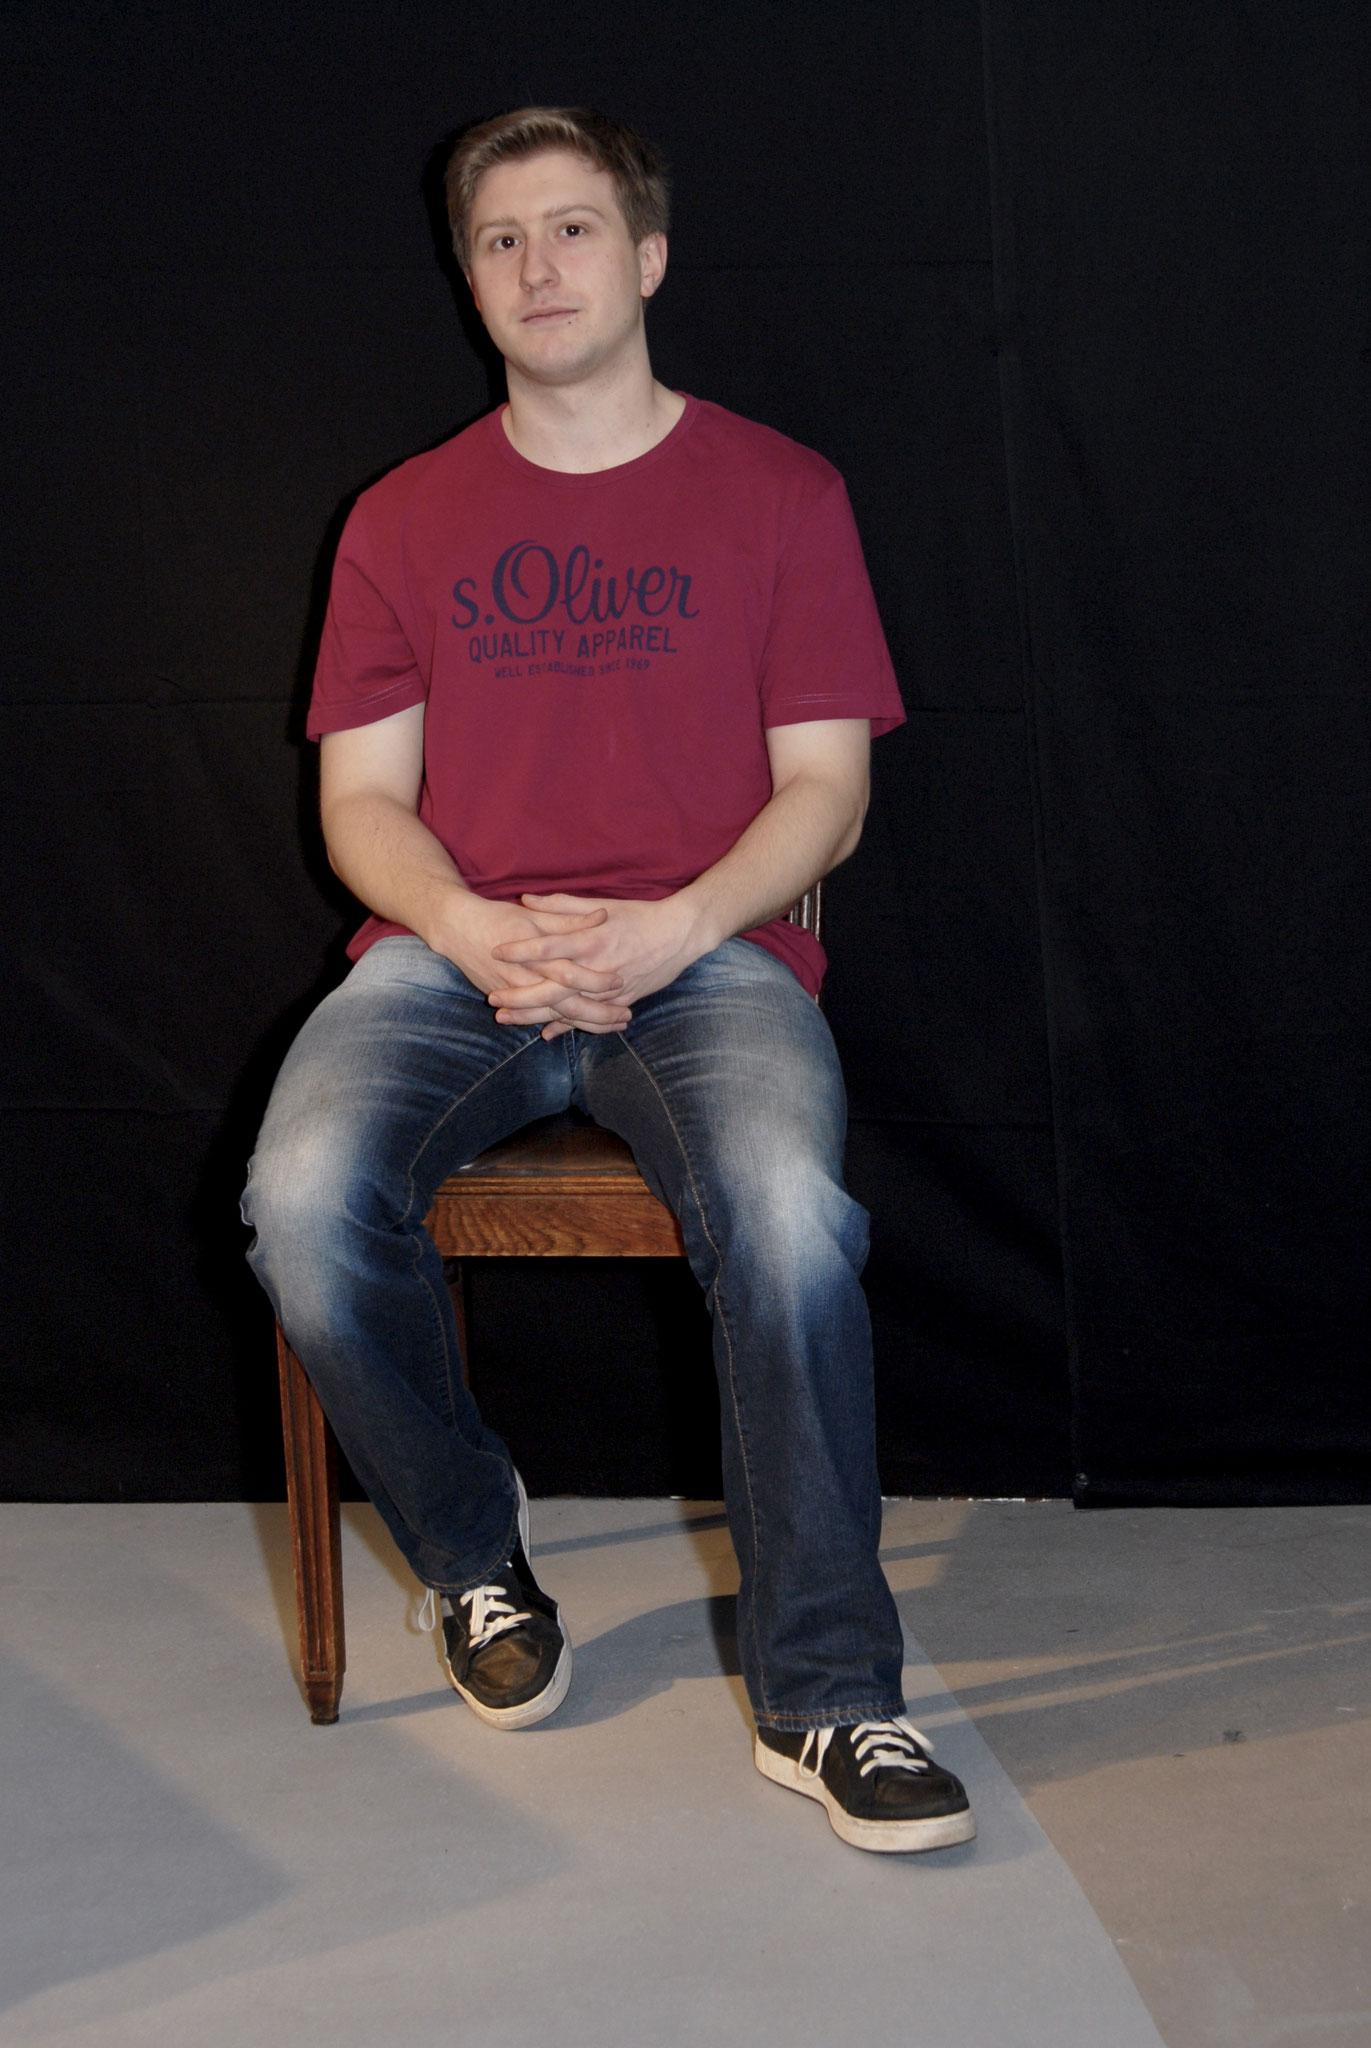 Tristan Fuhrman